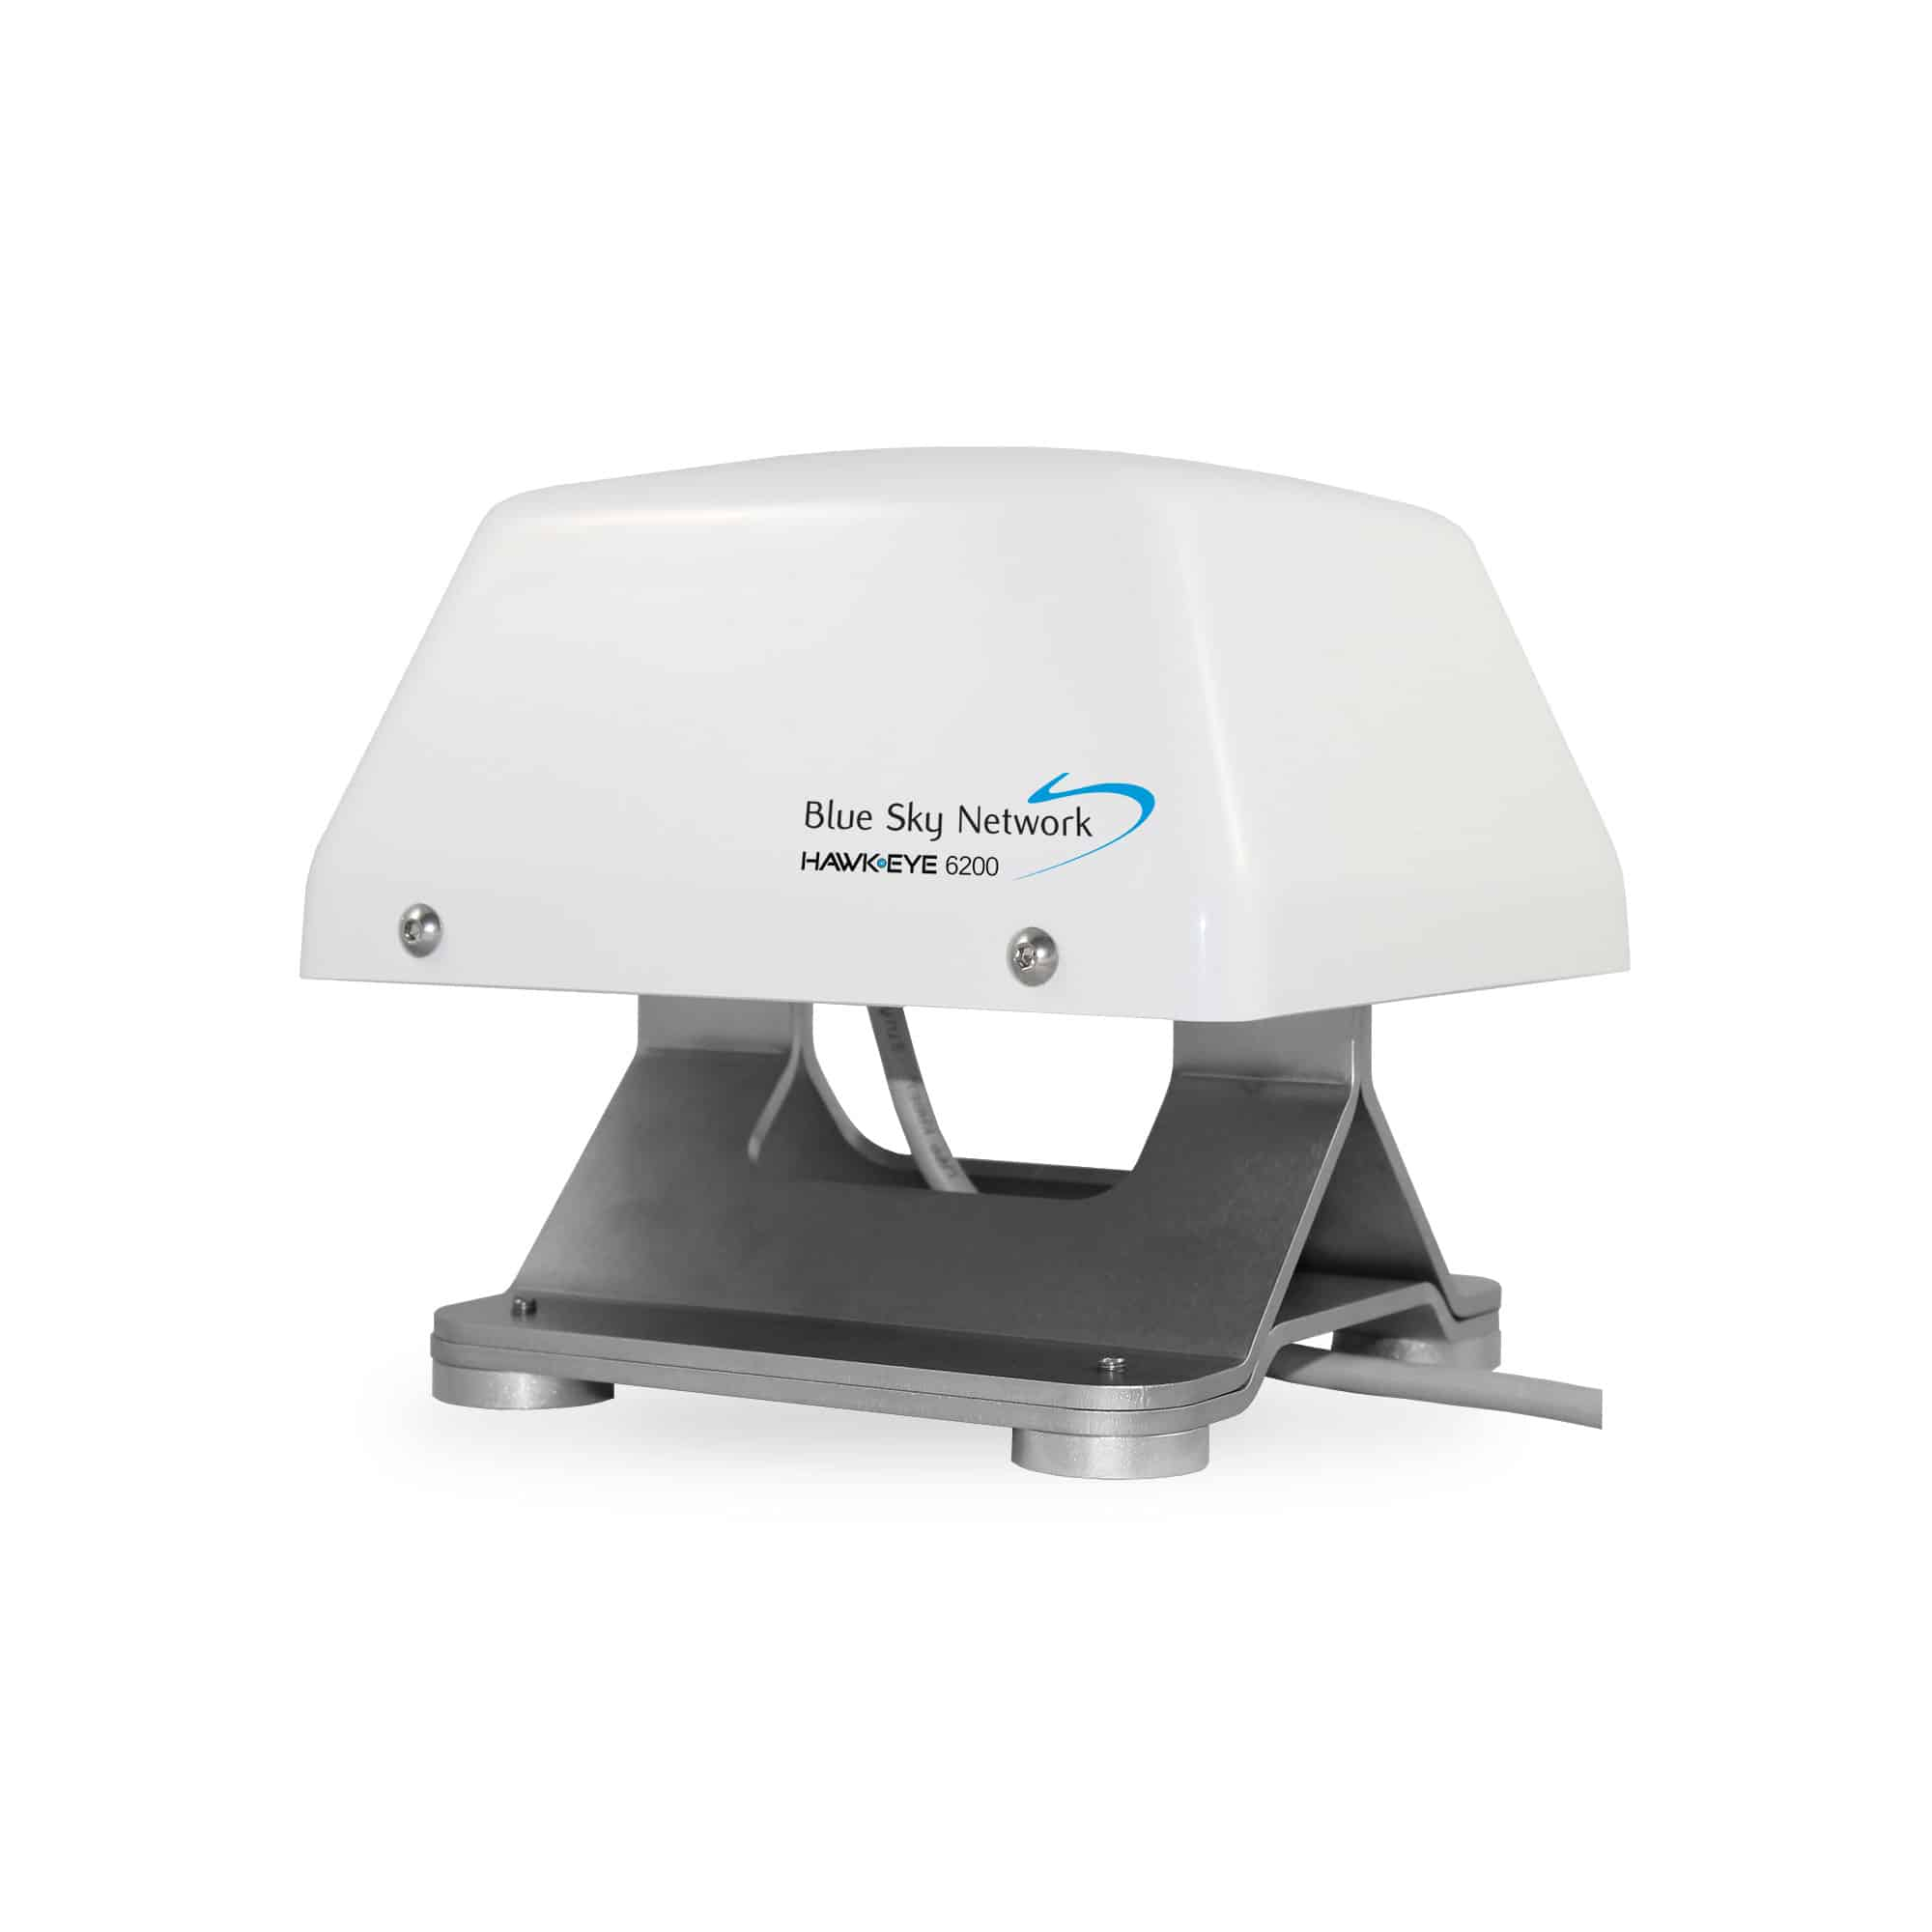 HawkEye 6200 Boat Tracking Device